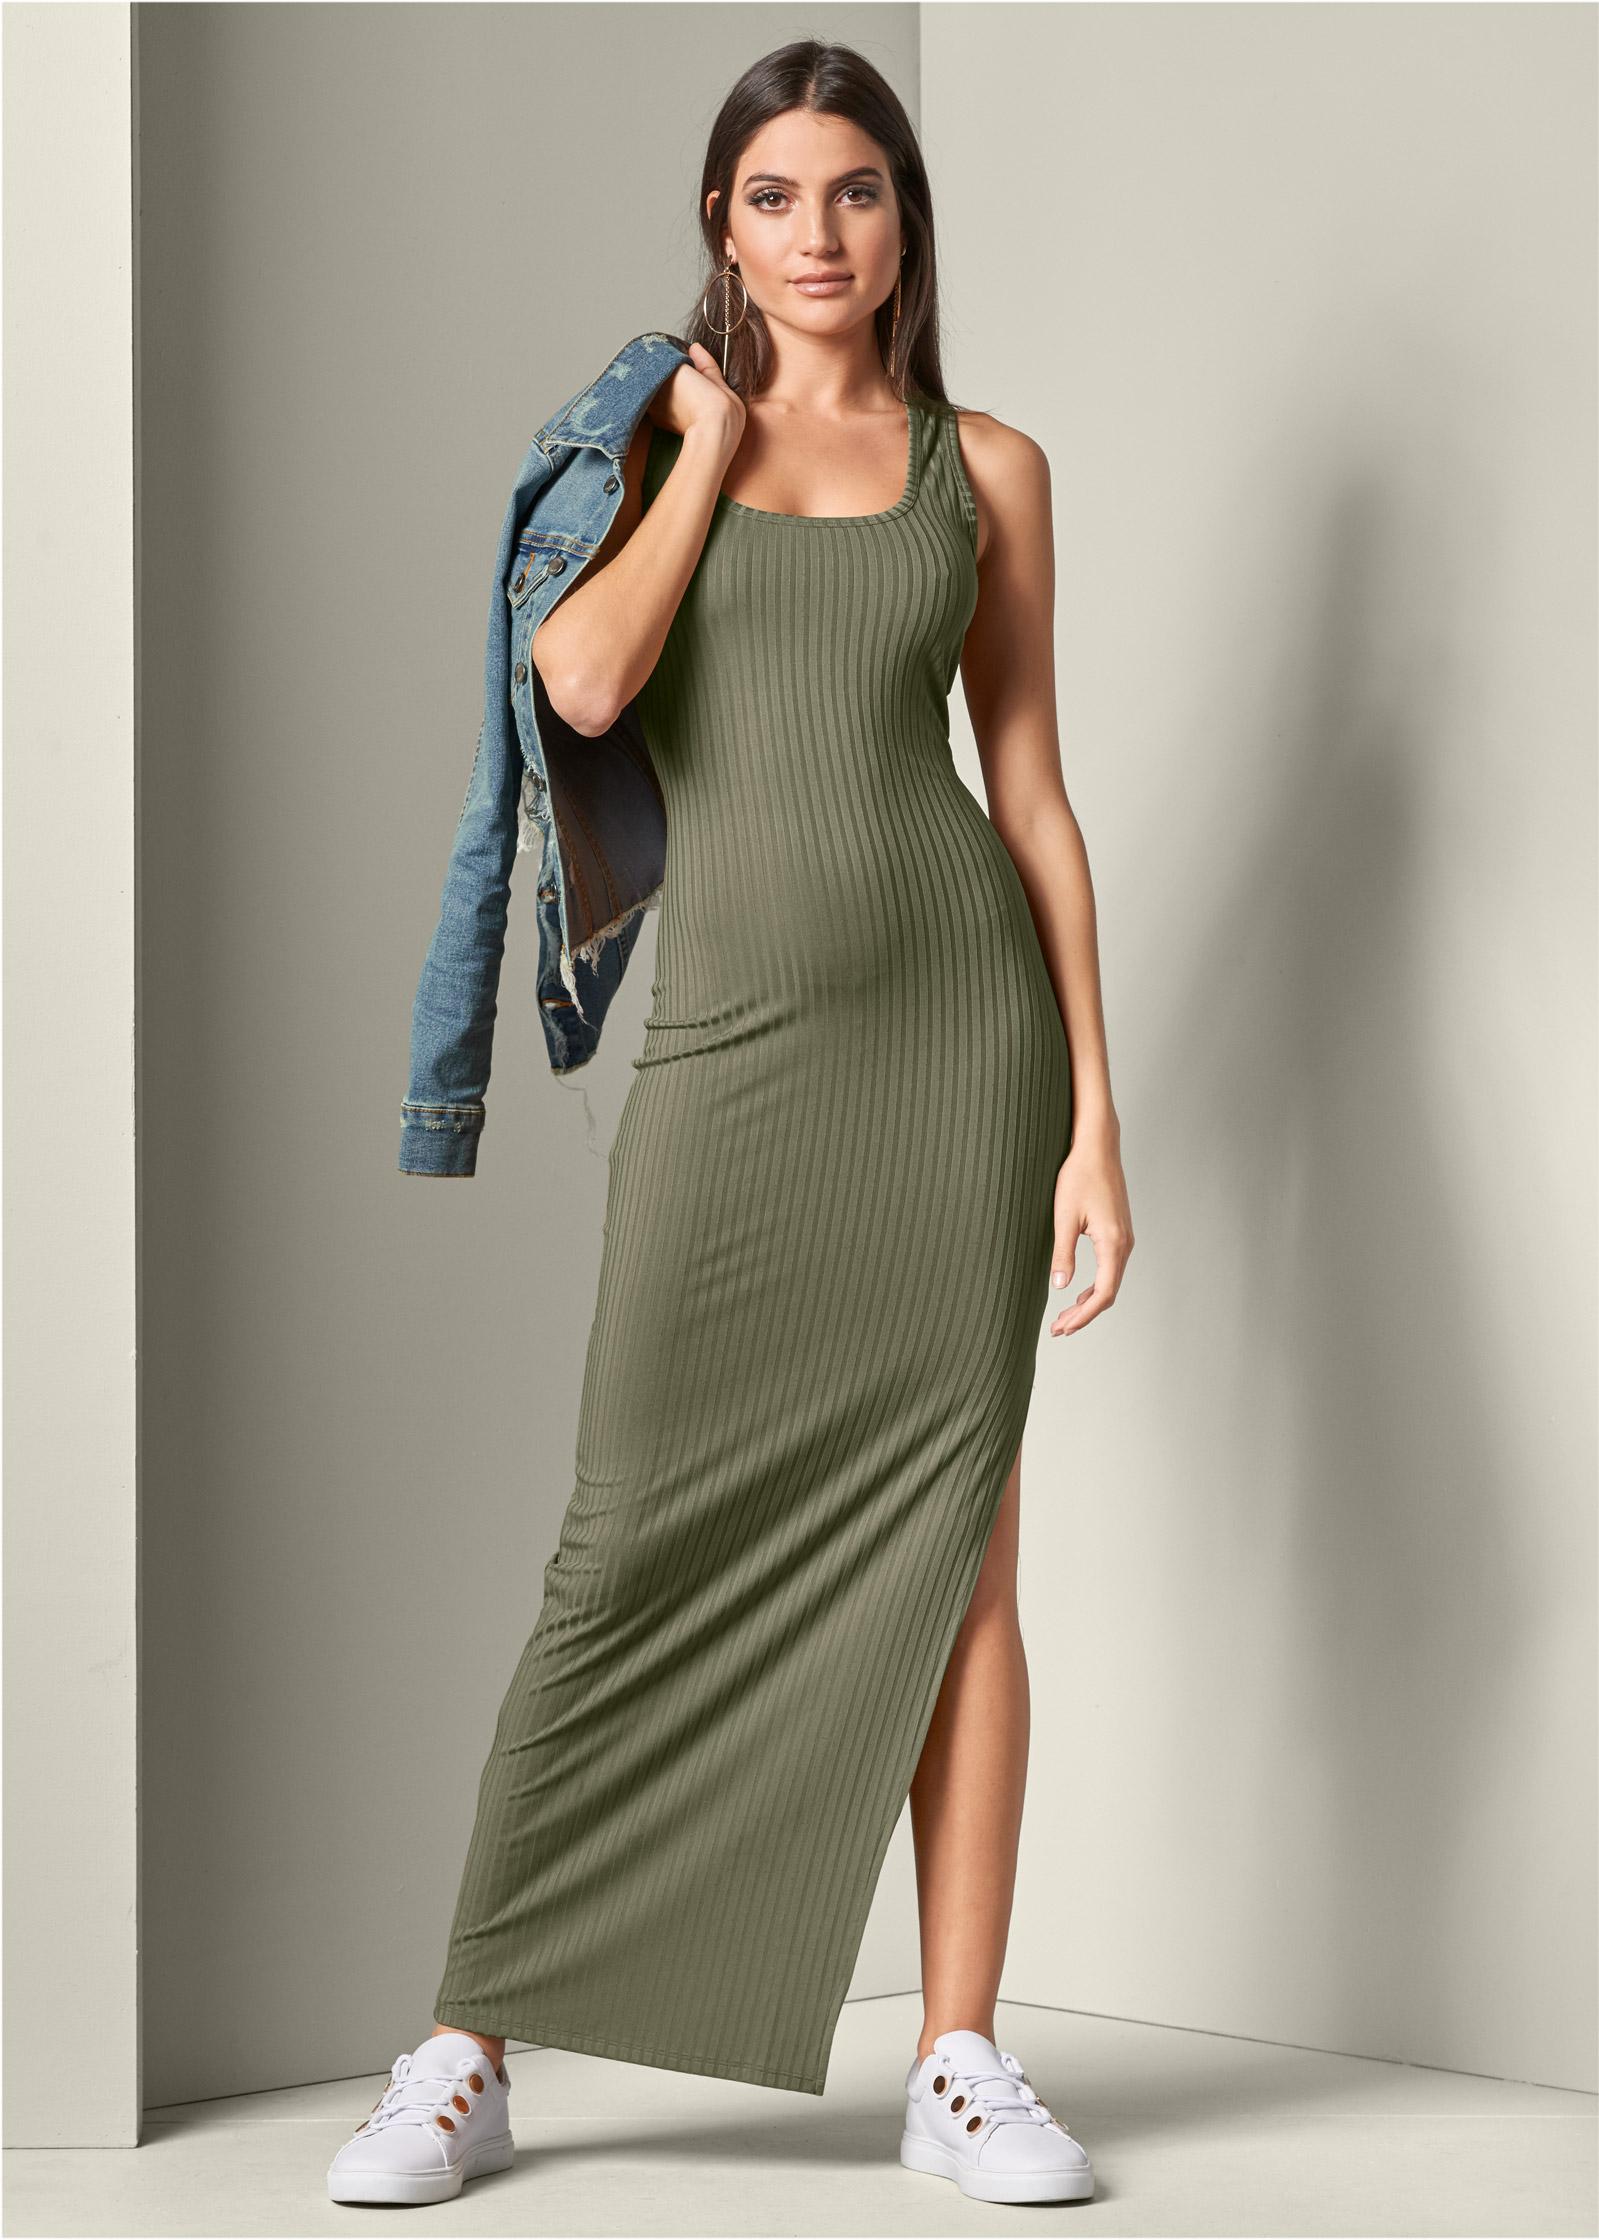 Ribbed Tank Maxi Dress In Olive VENUS